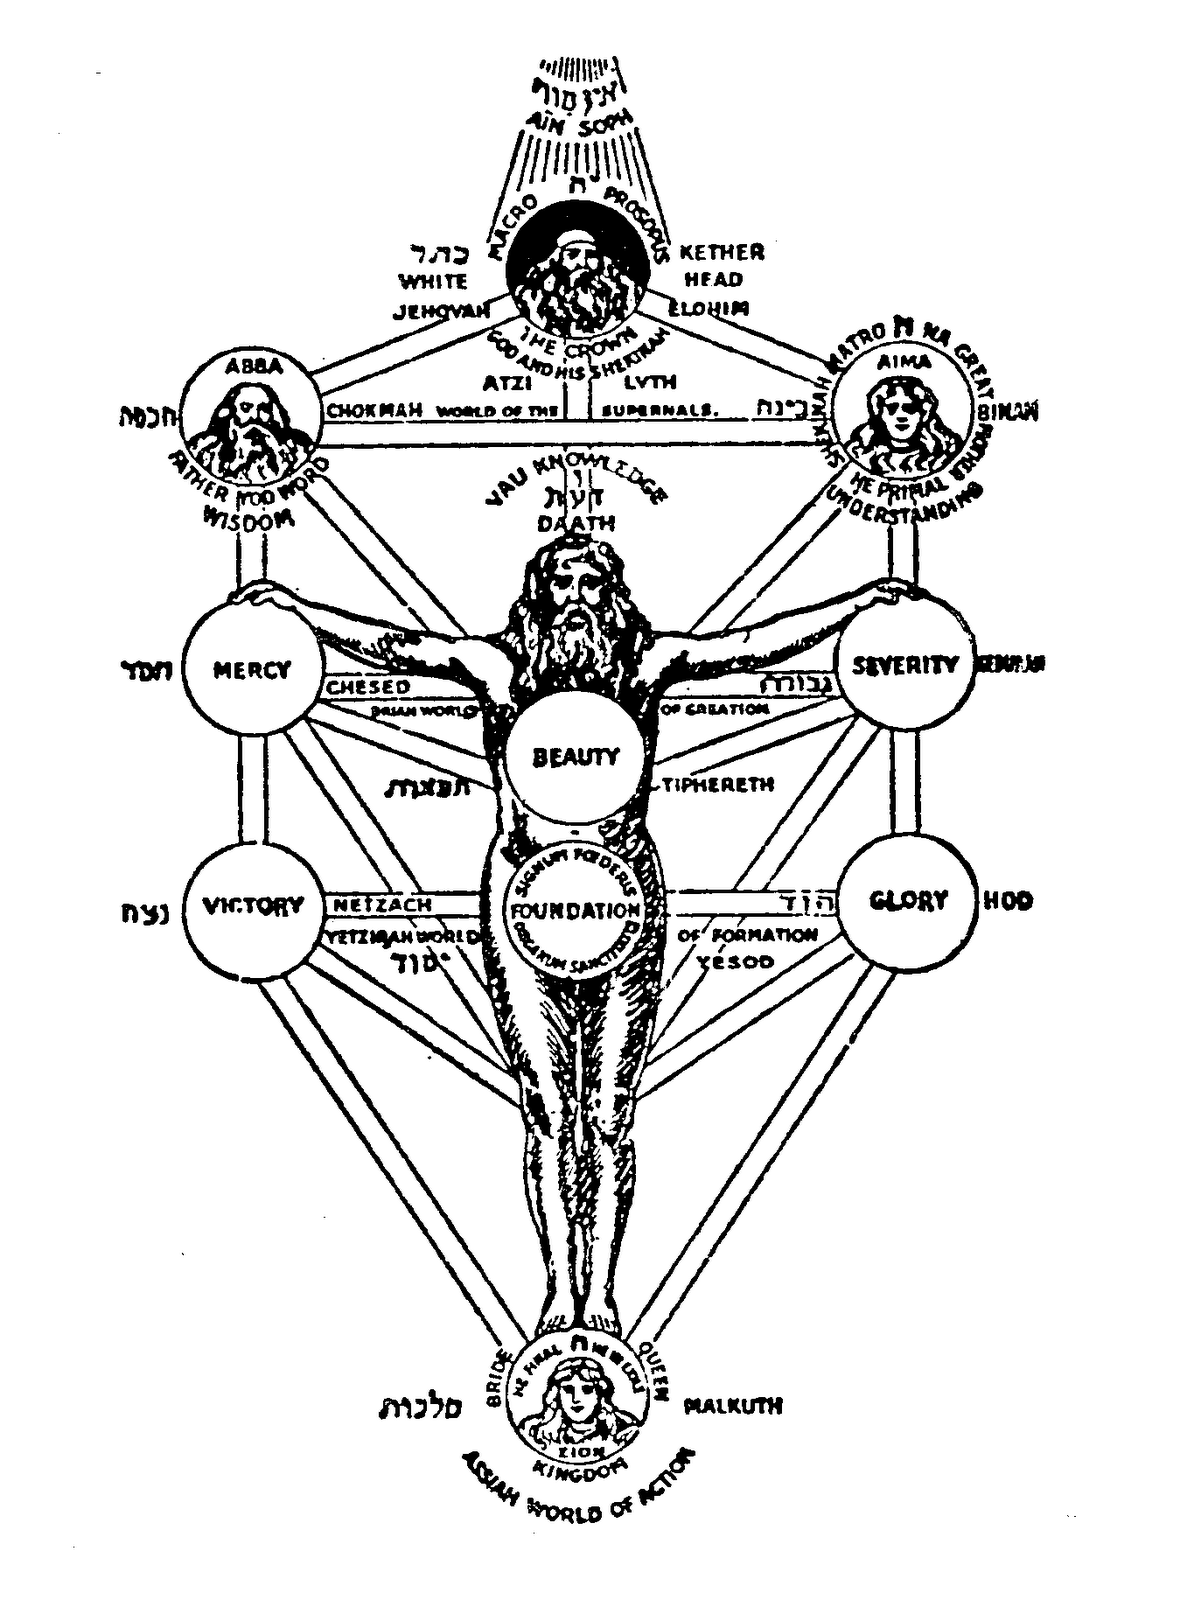 Tree Of Life Ars Magine An Imaginarium Of Illogical Vvvvv